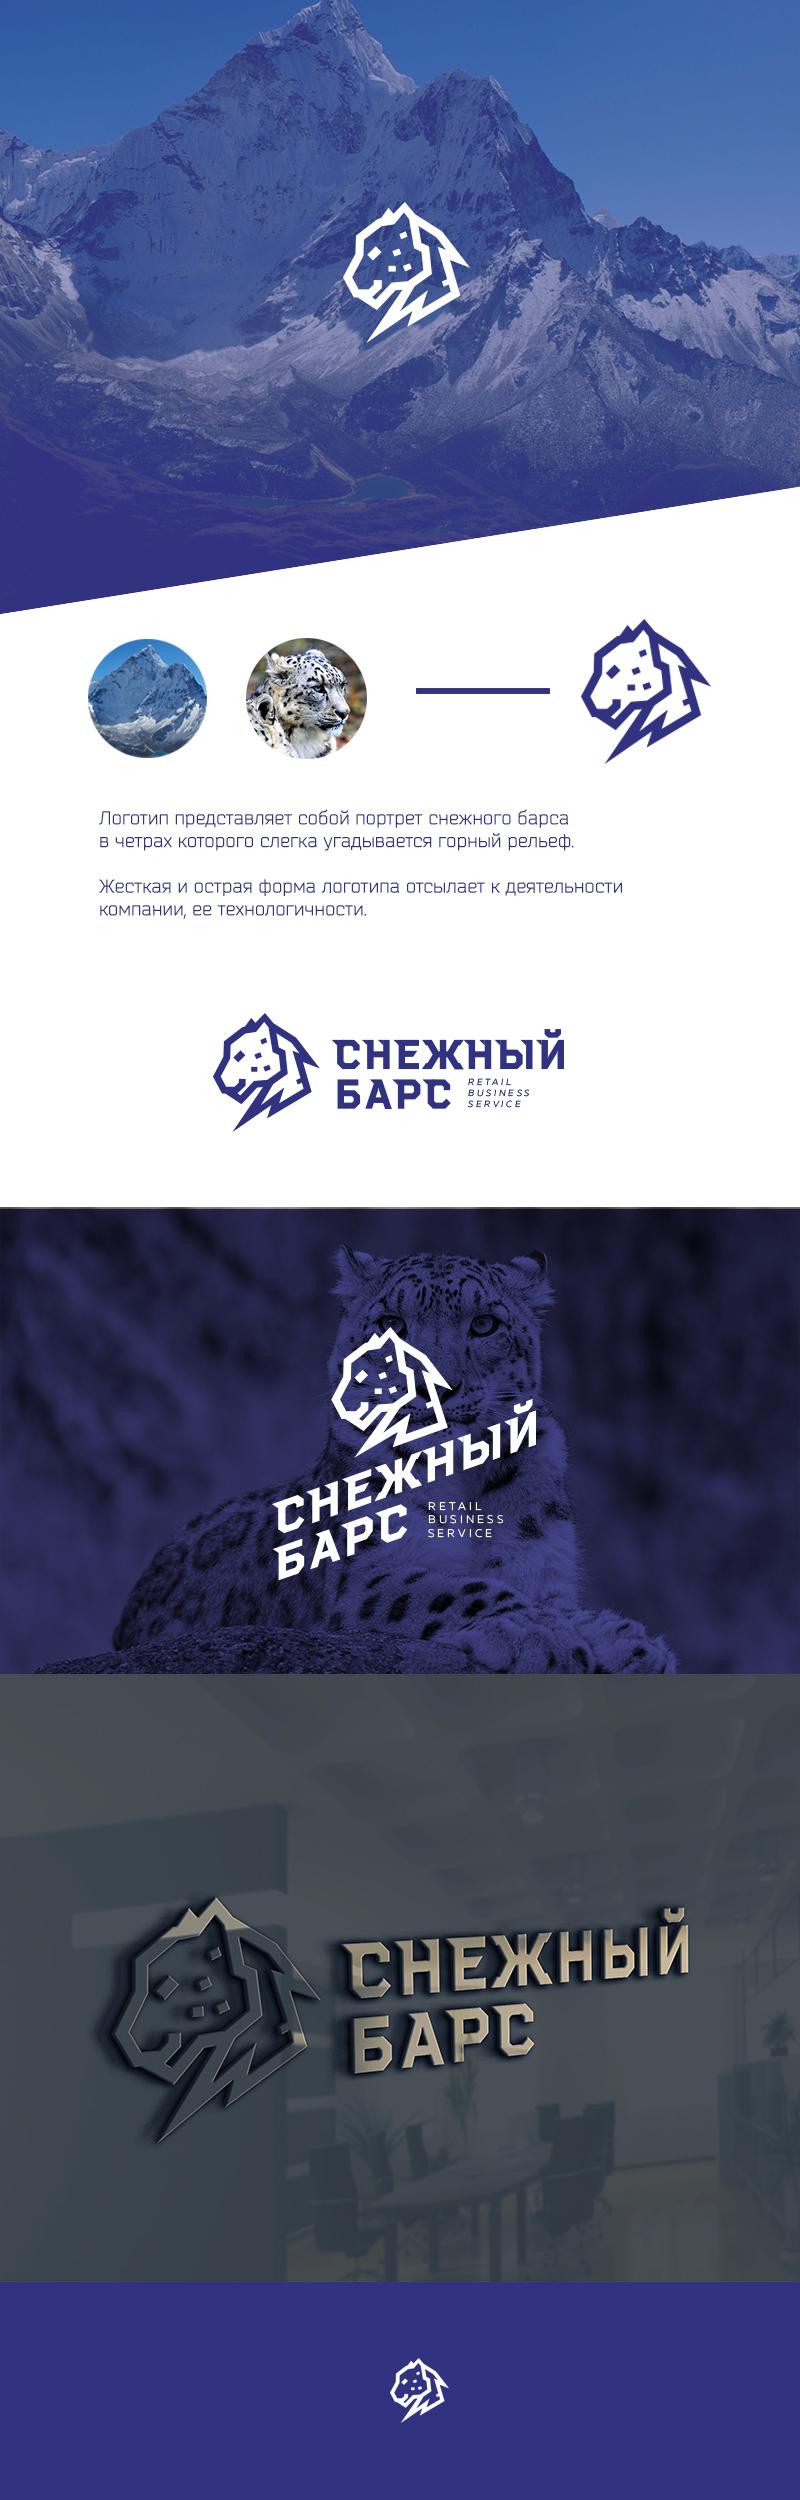 Ре-дизайн (рестайлинг) логотипа компании фото f_2925a82e61eb0663.jpg